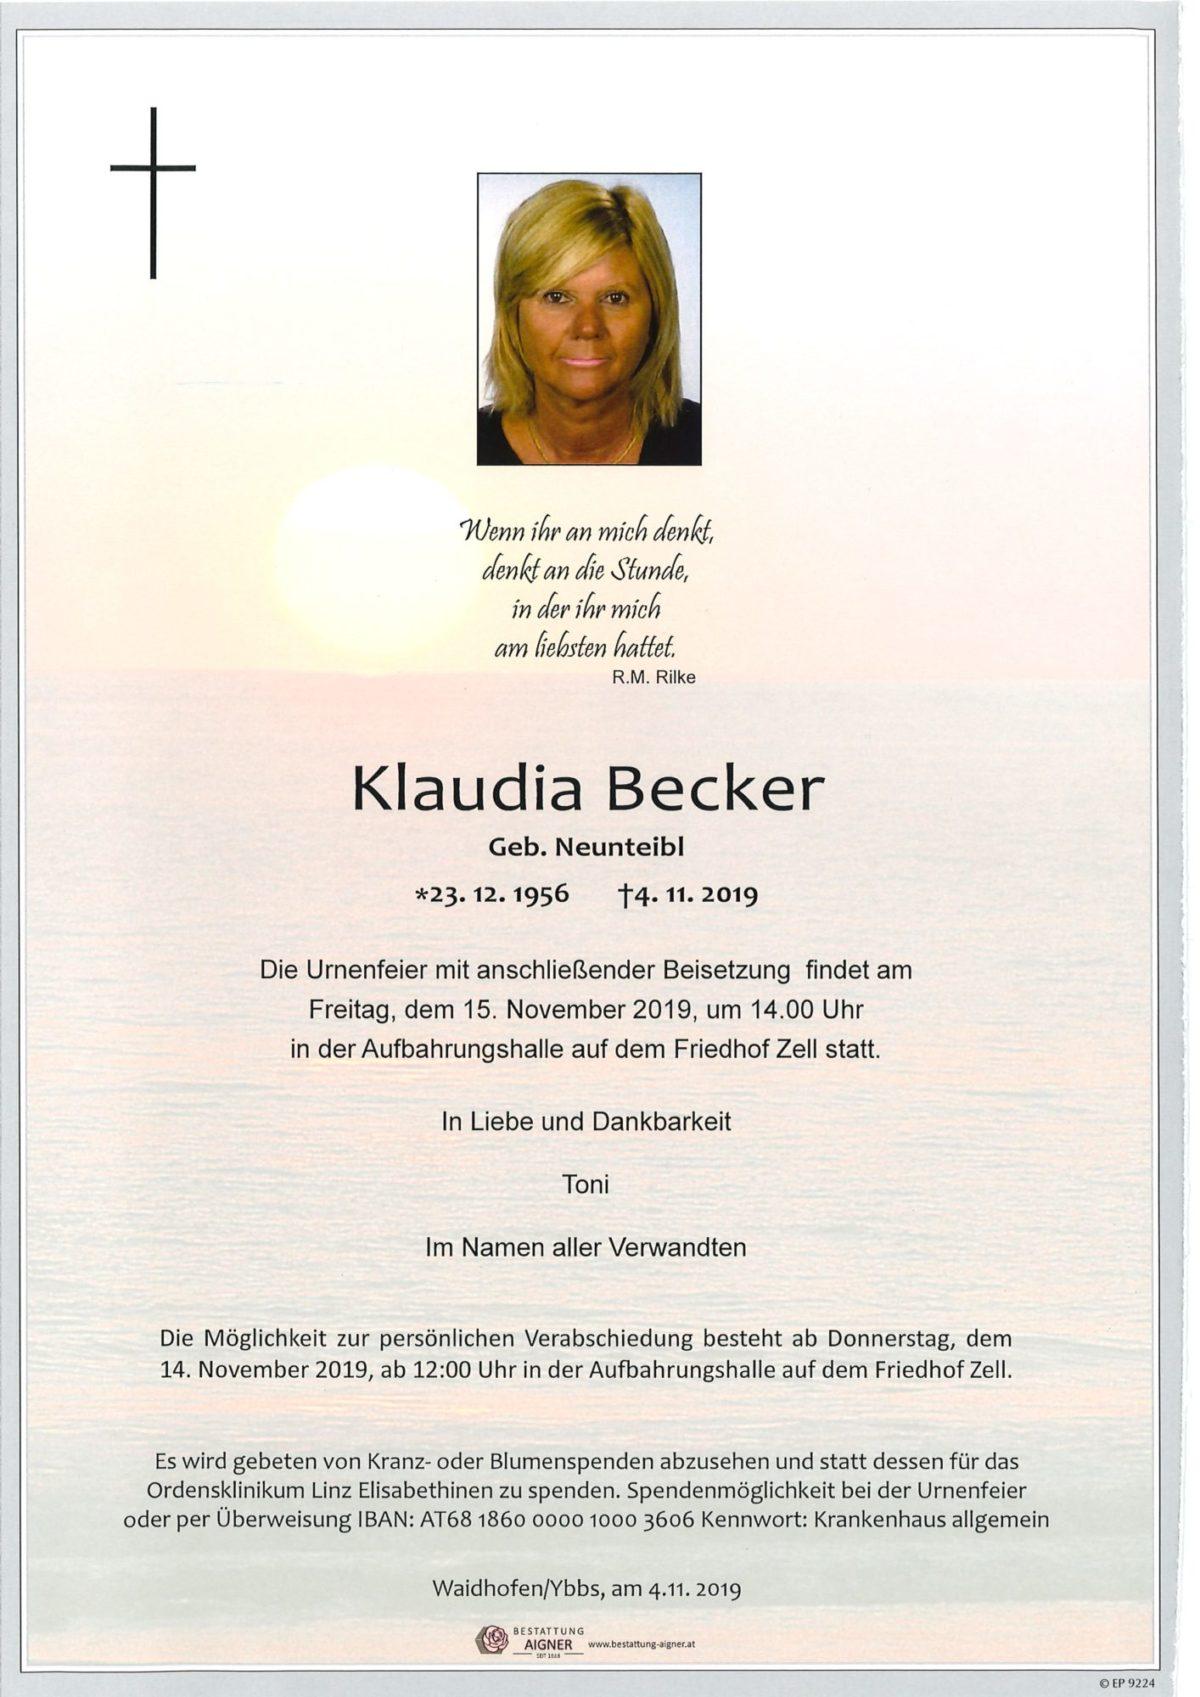 Klaudia Becker